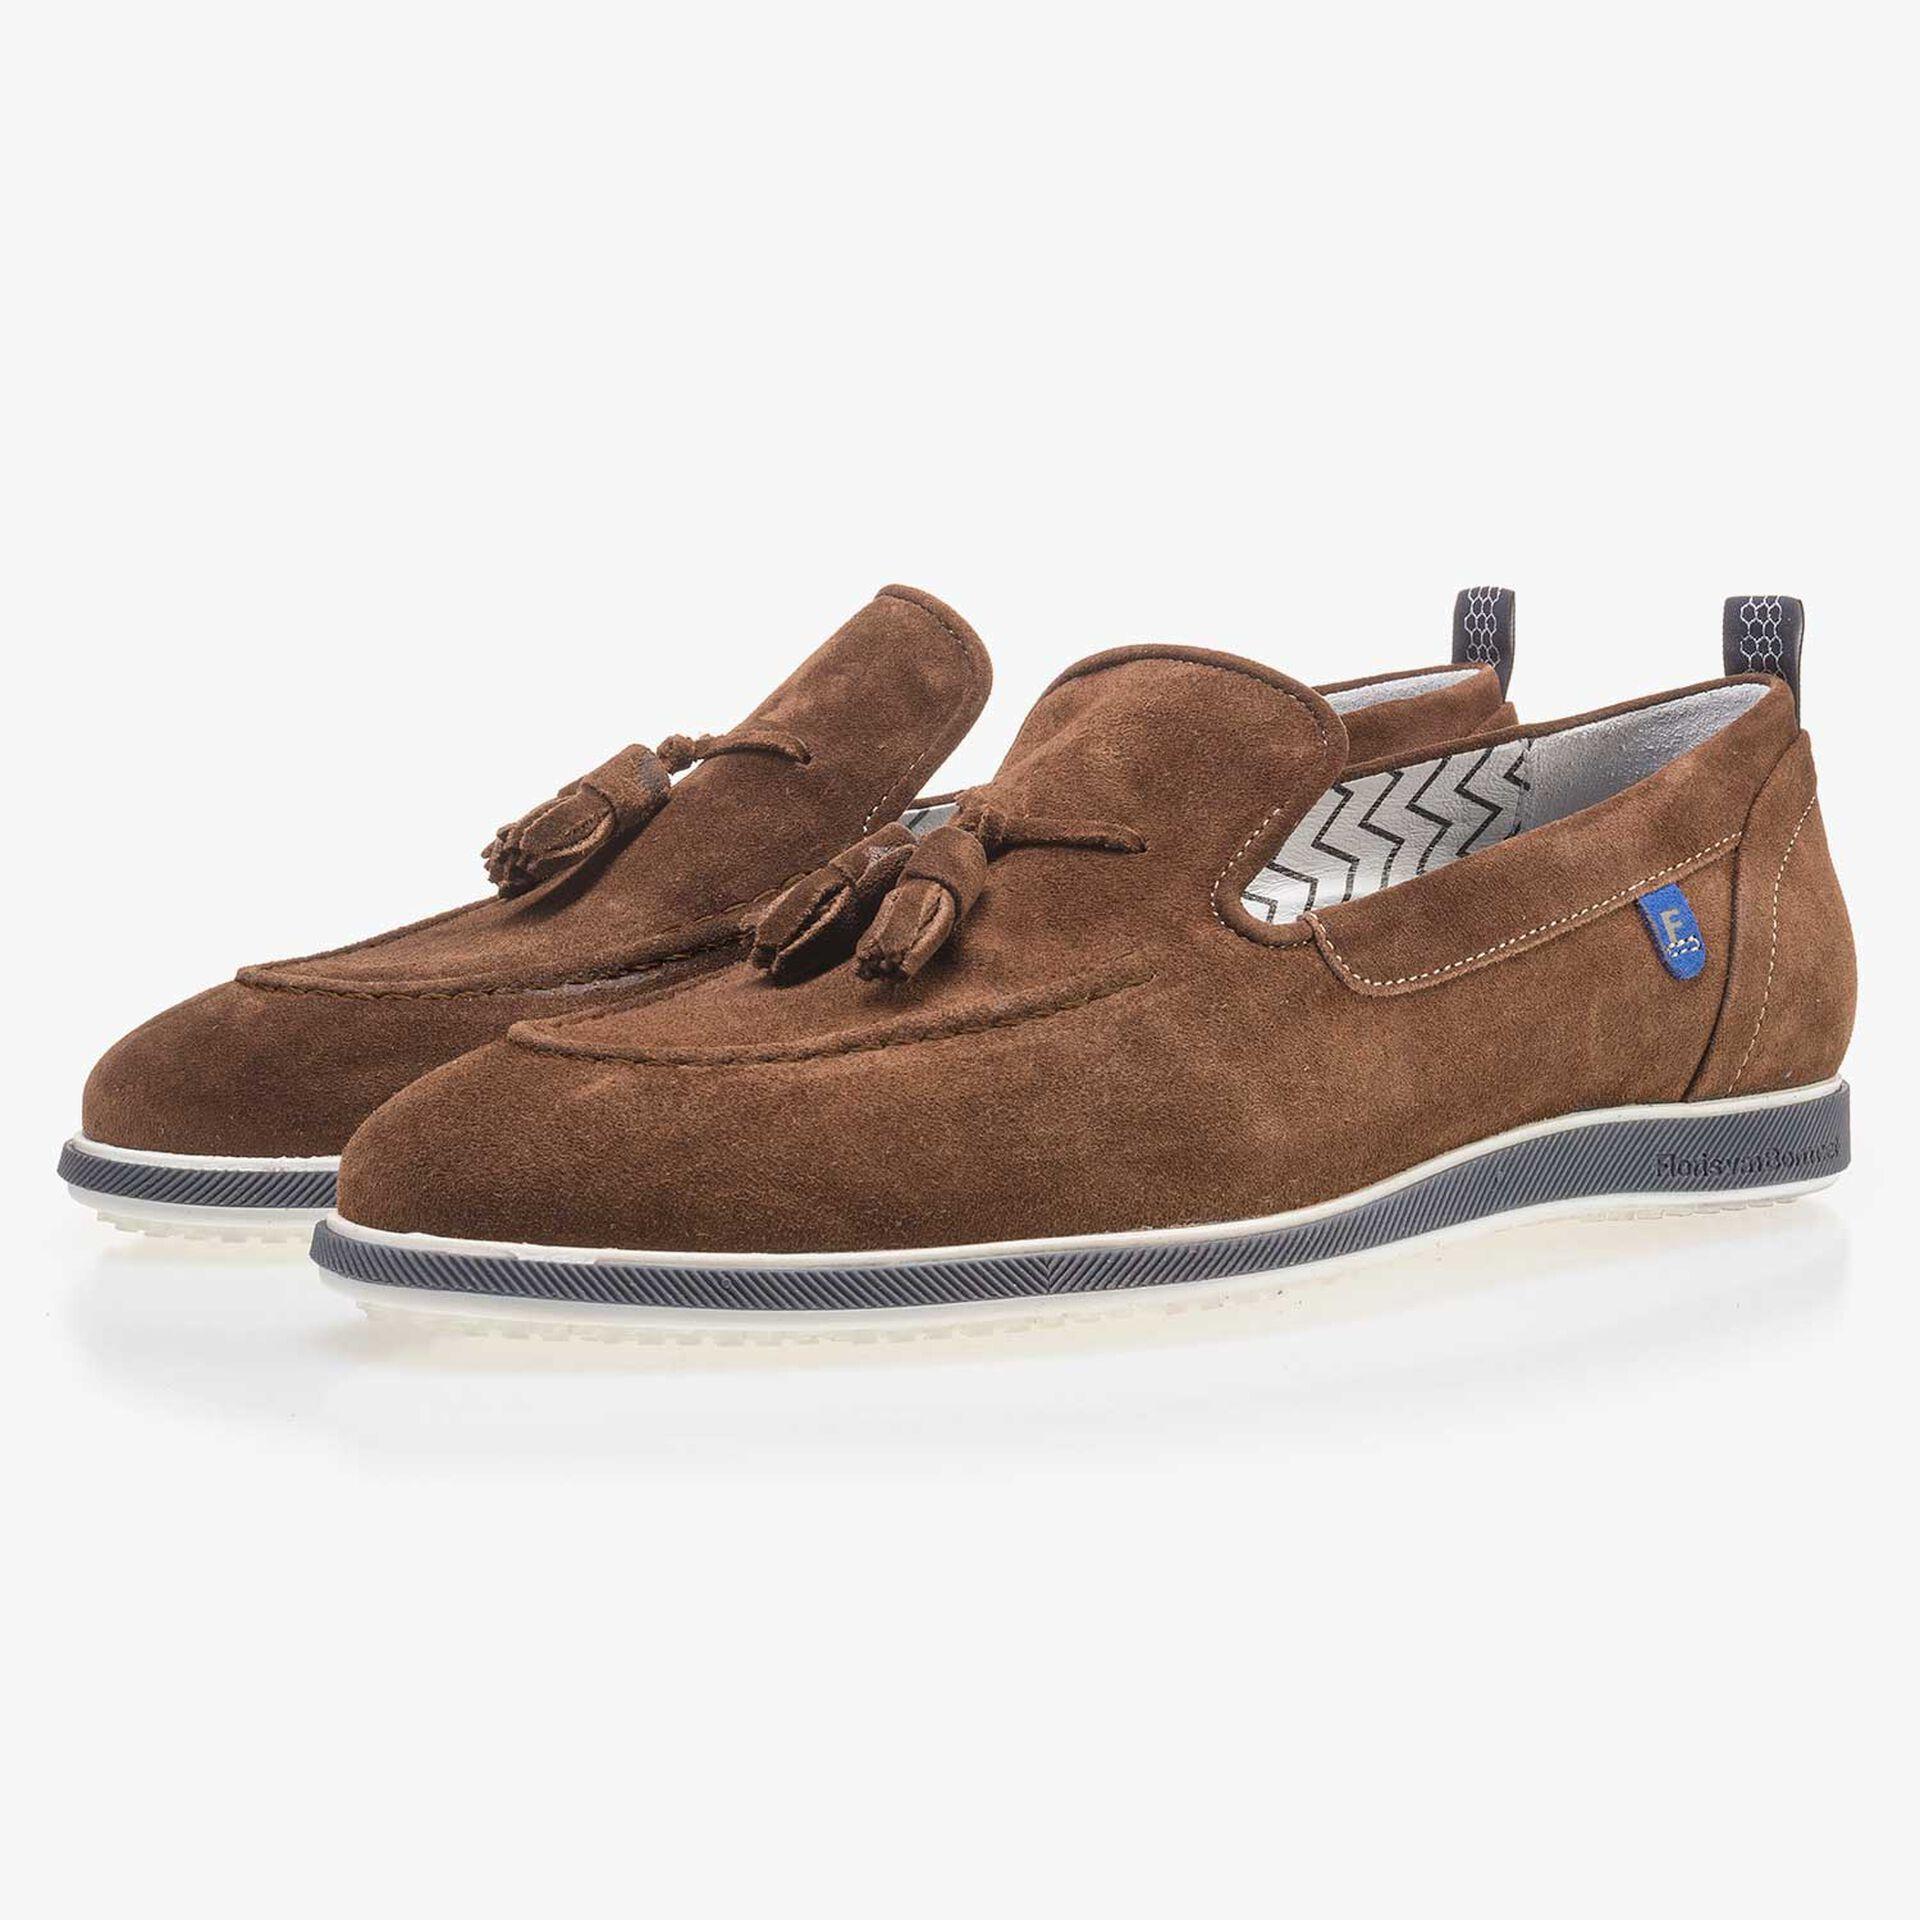 Brown suede leather tassel loafer